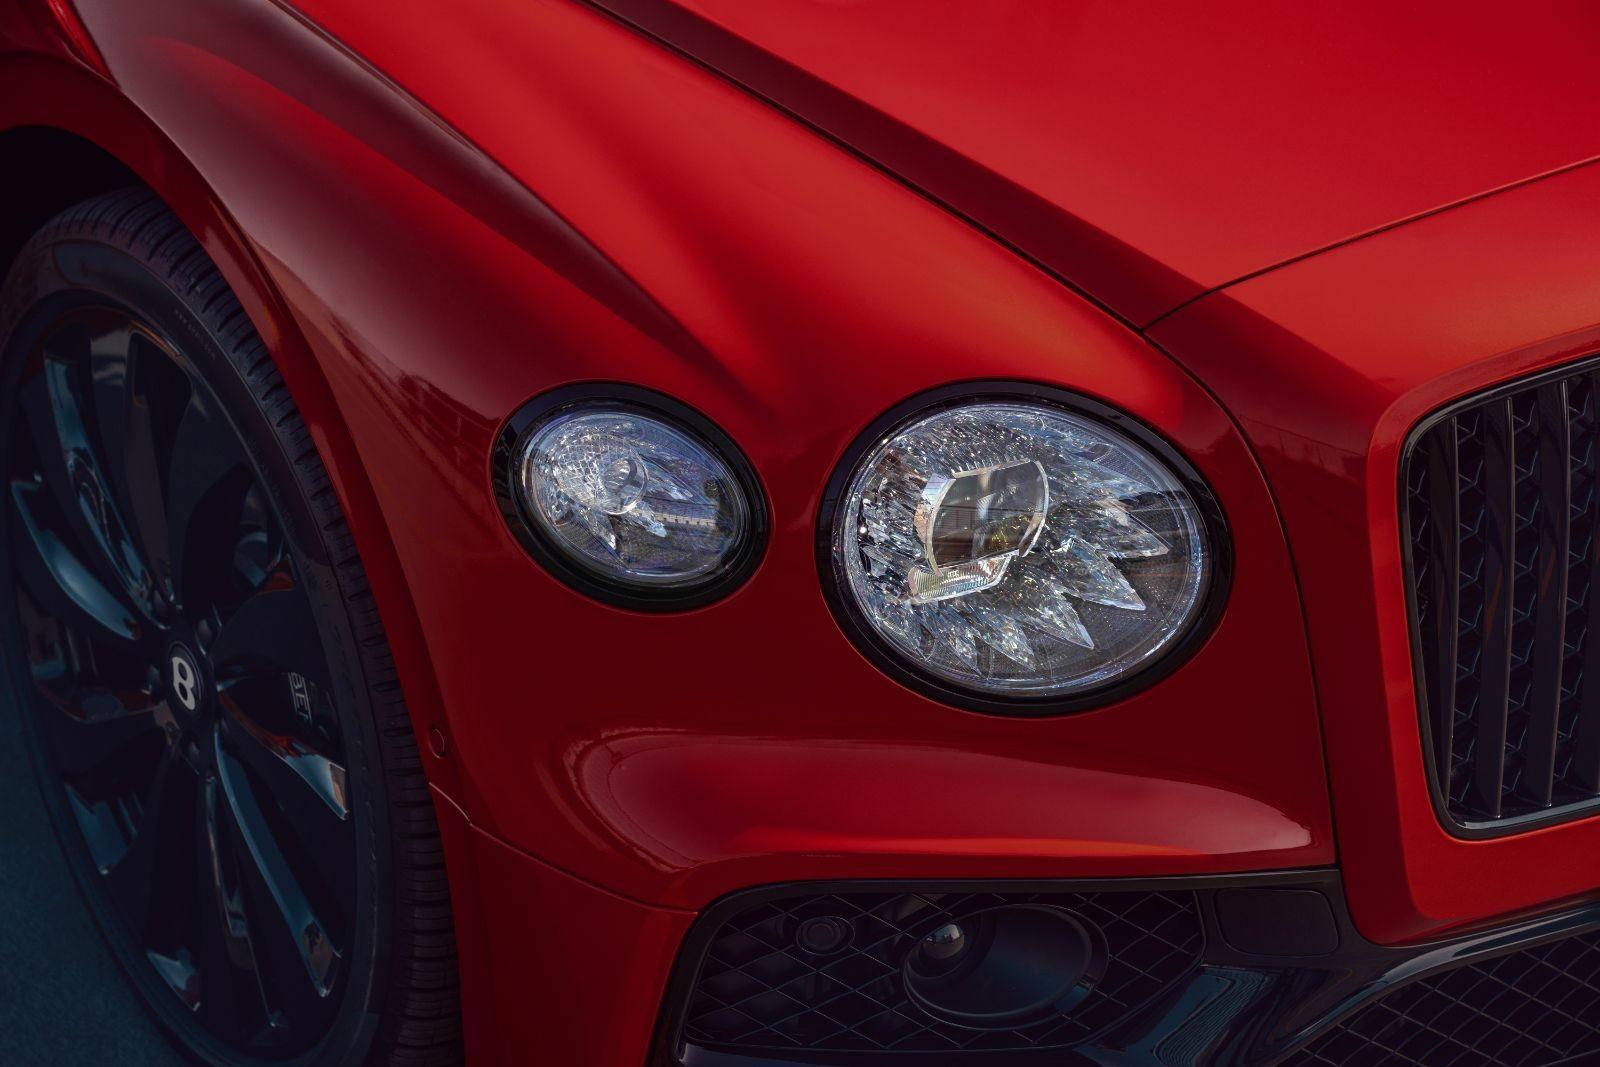 Bentley Flying Spur V8 - Bentley Flying Spur V8